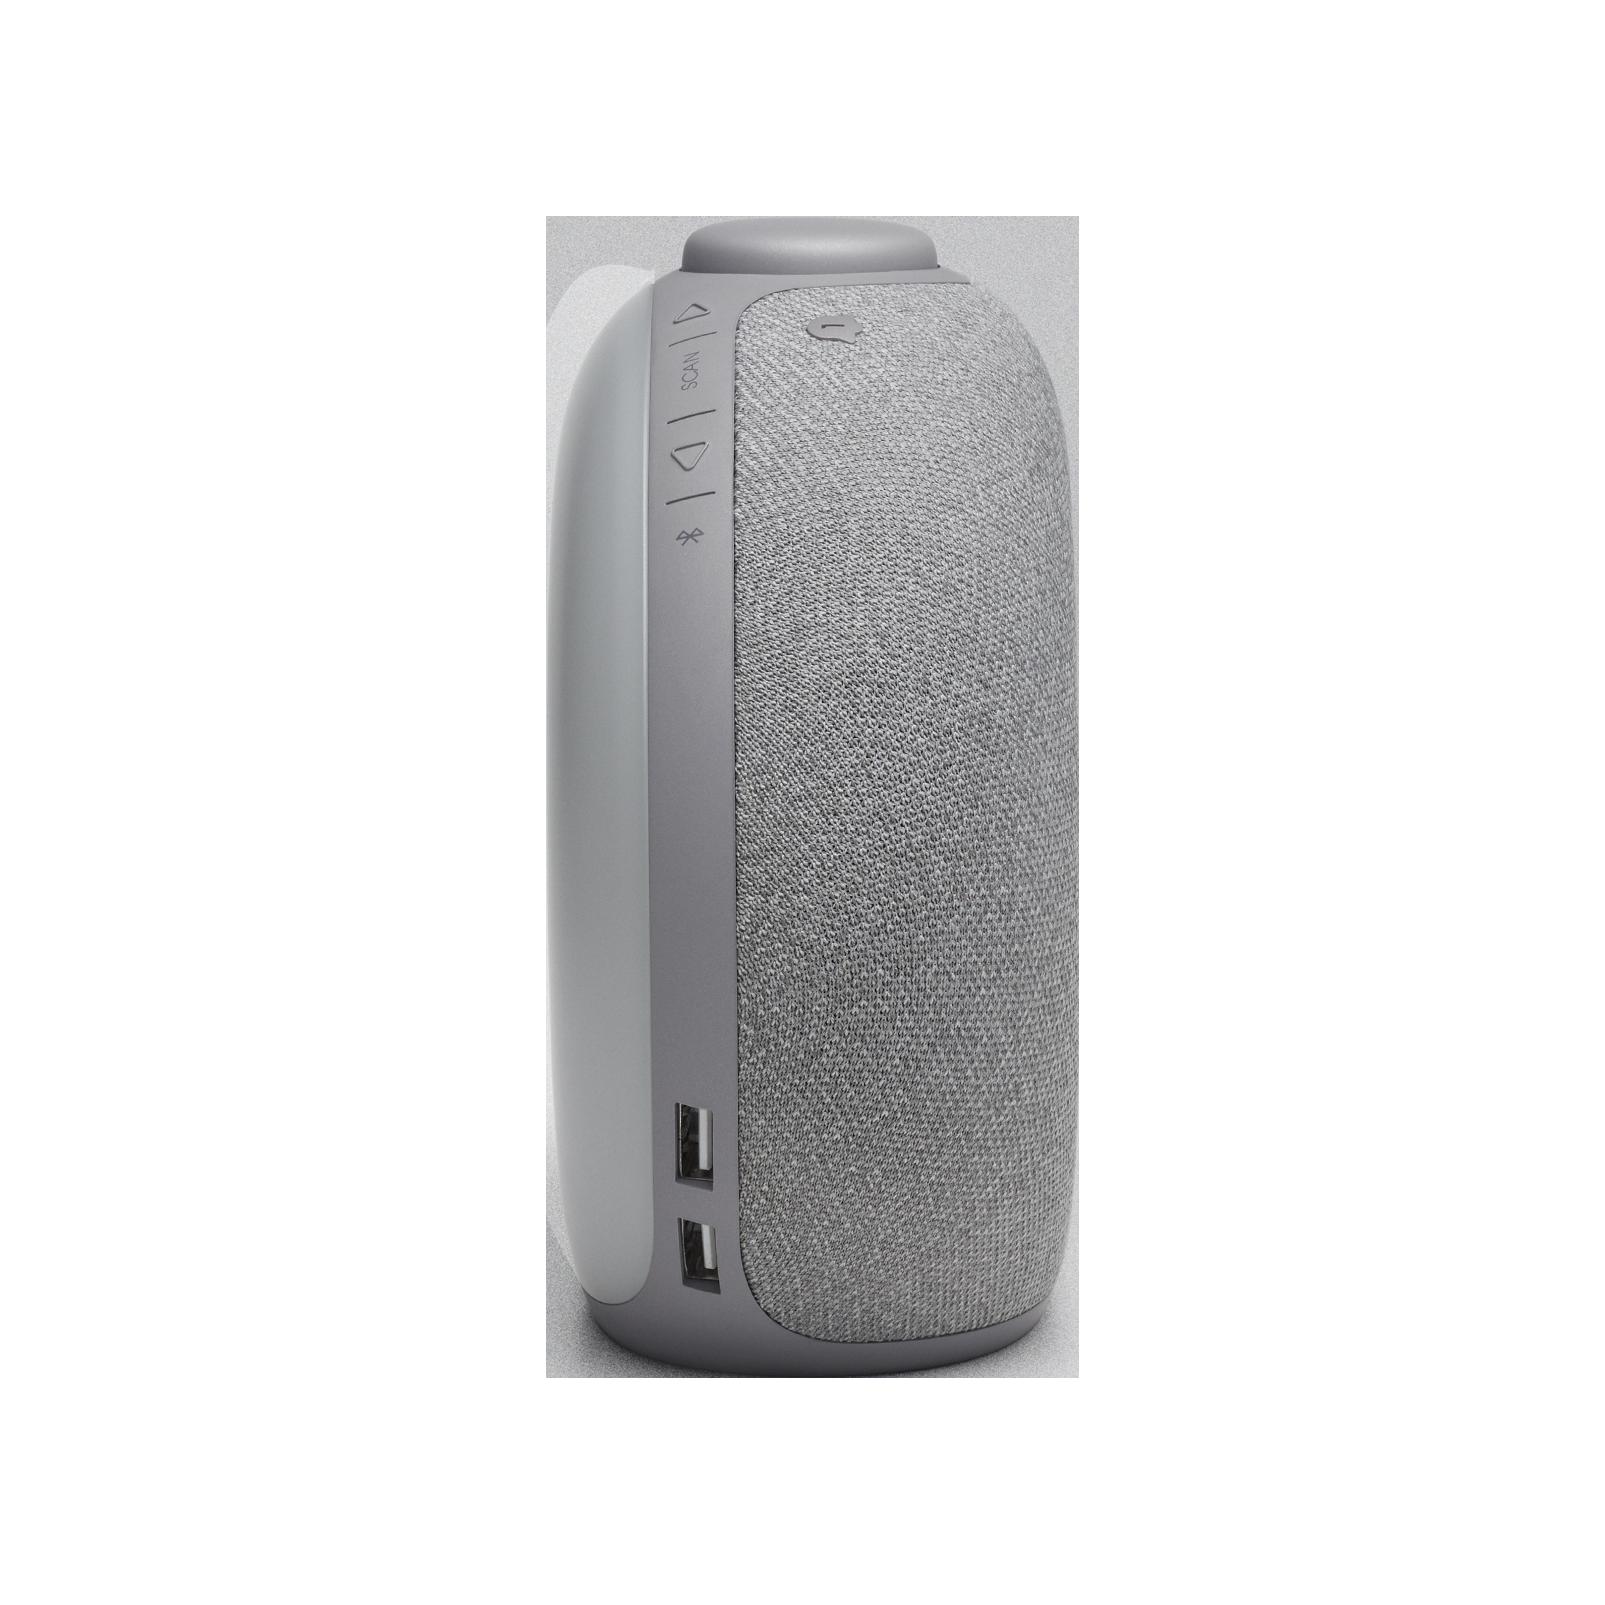 JBL Horizon 2 DAB - Grey - Bluetooth clock radio speaker with DAB/DAB+/FM - Right